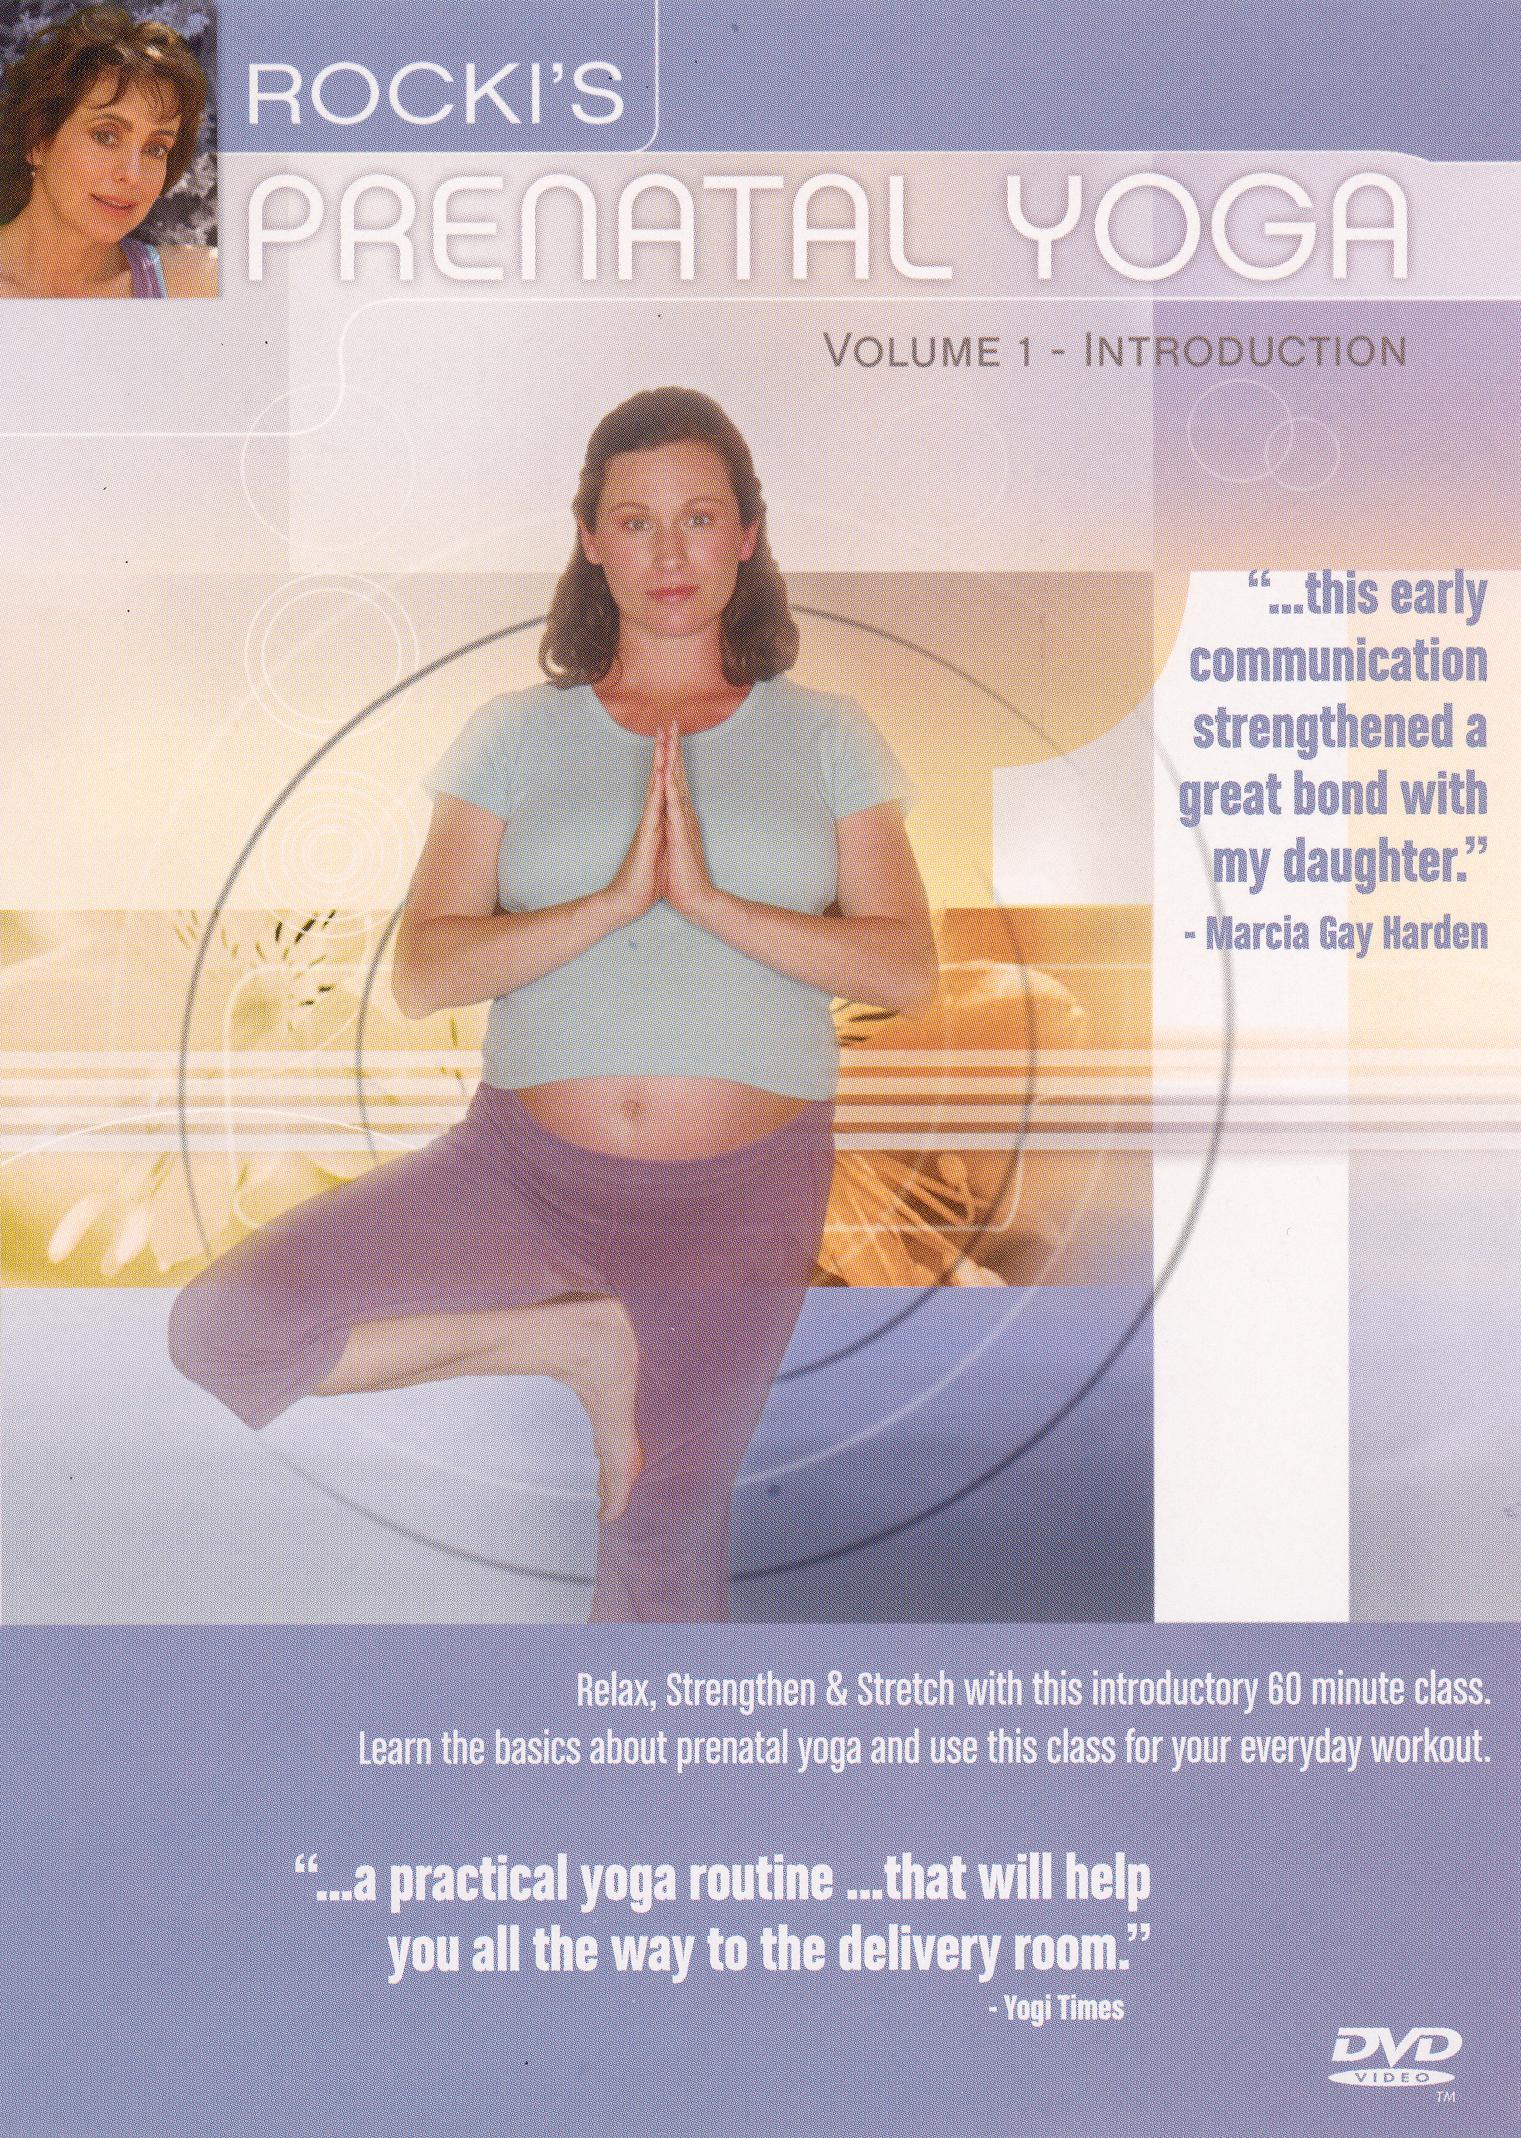 Rocki's Prenatal Yoga, Vol. 1: Introduction